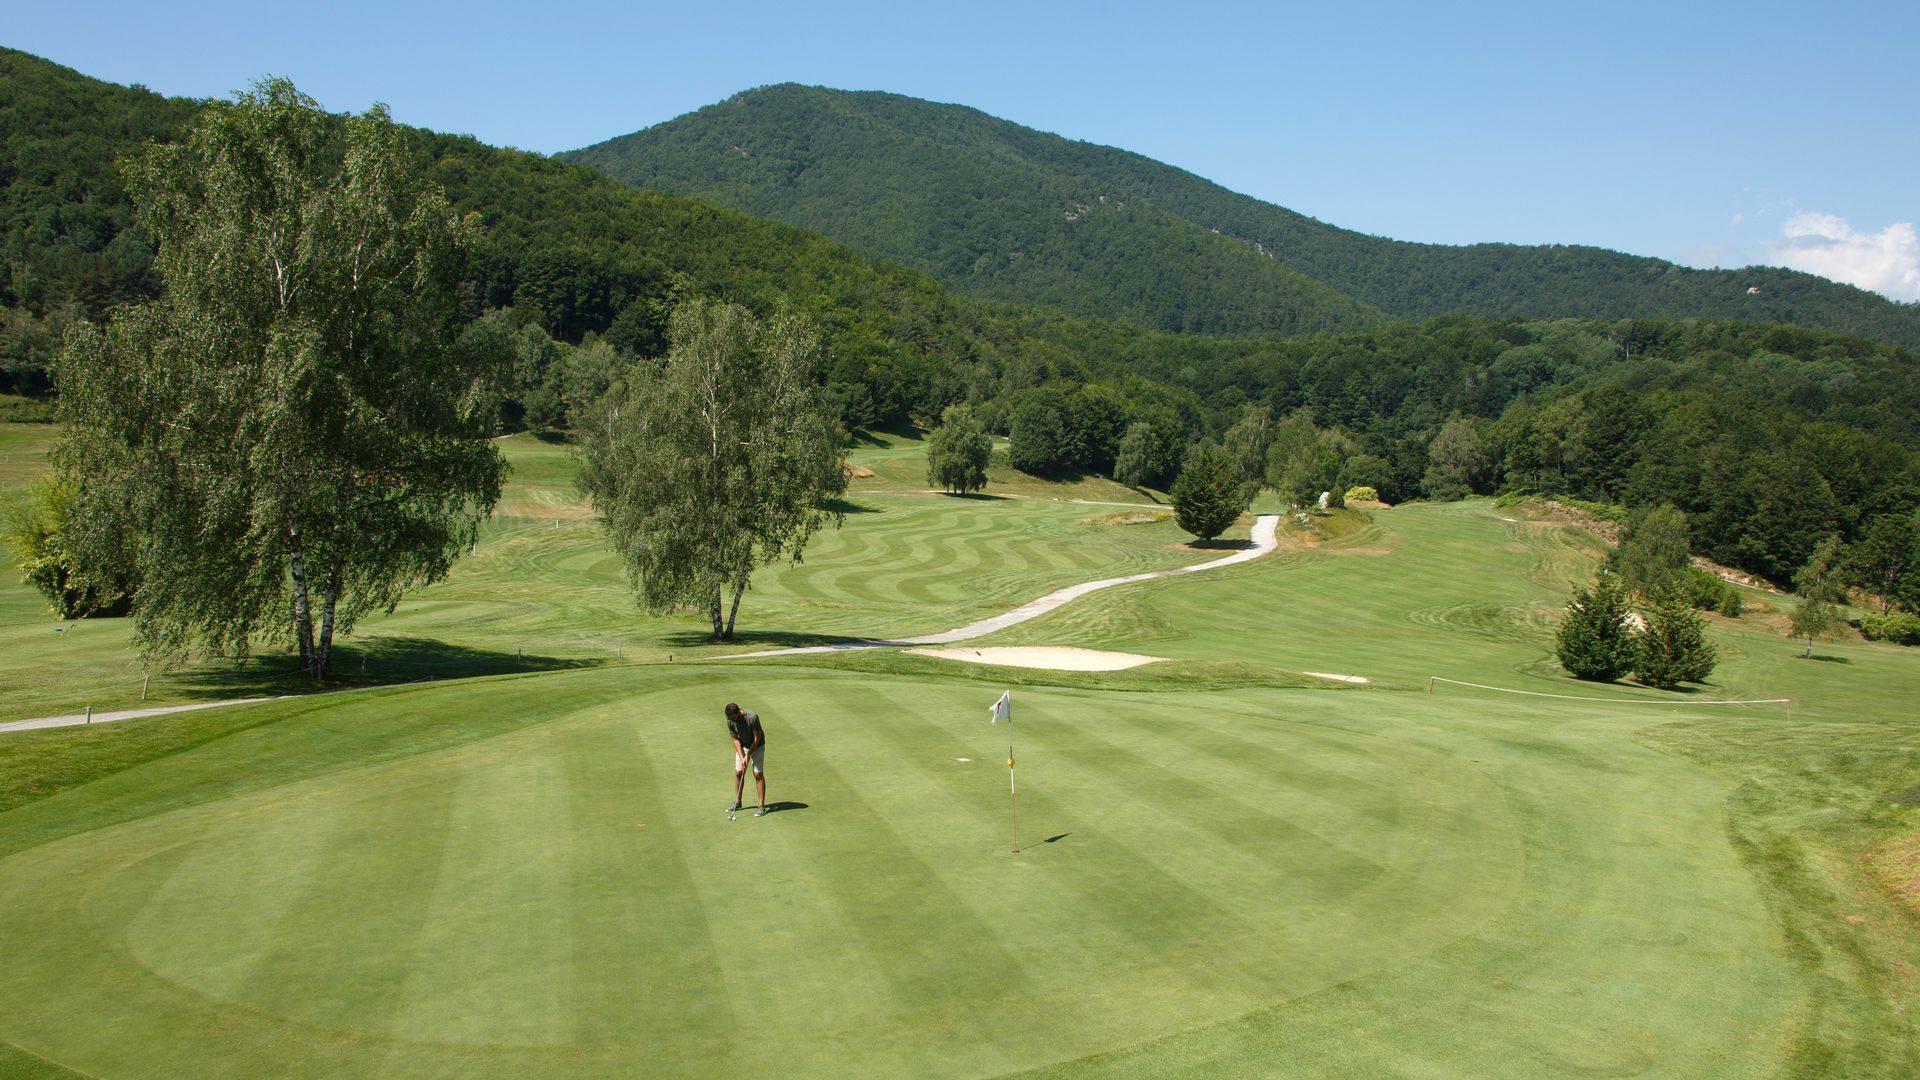 Le-Domaine-de-Falgos-Golf-Spa-occitanie-golf-seminaires-de-caractere